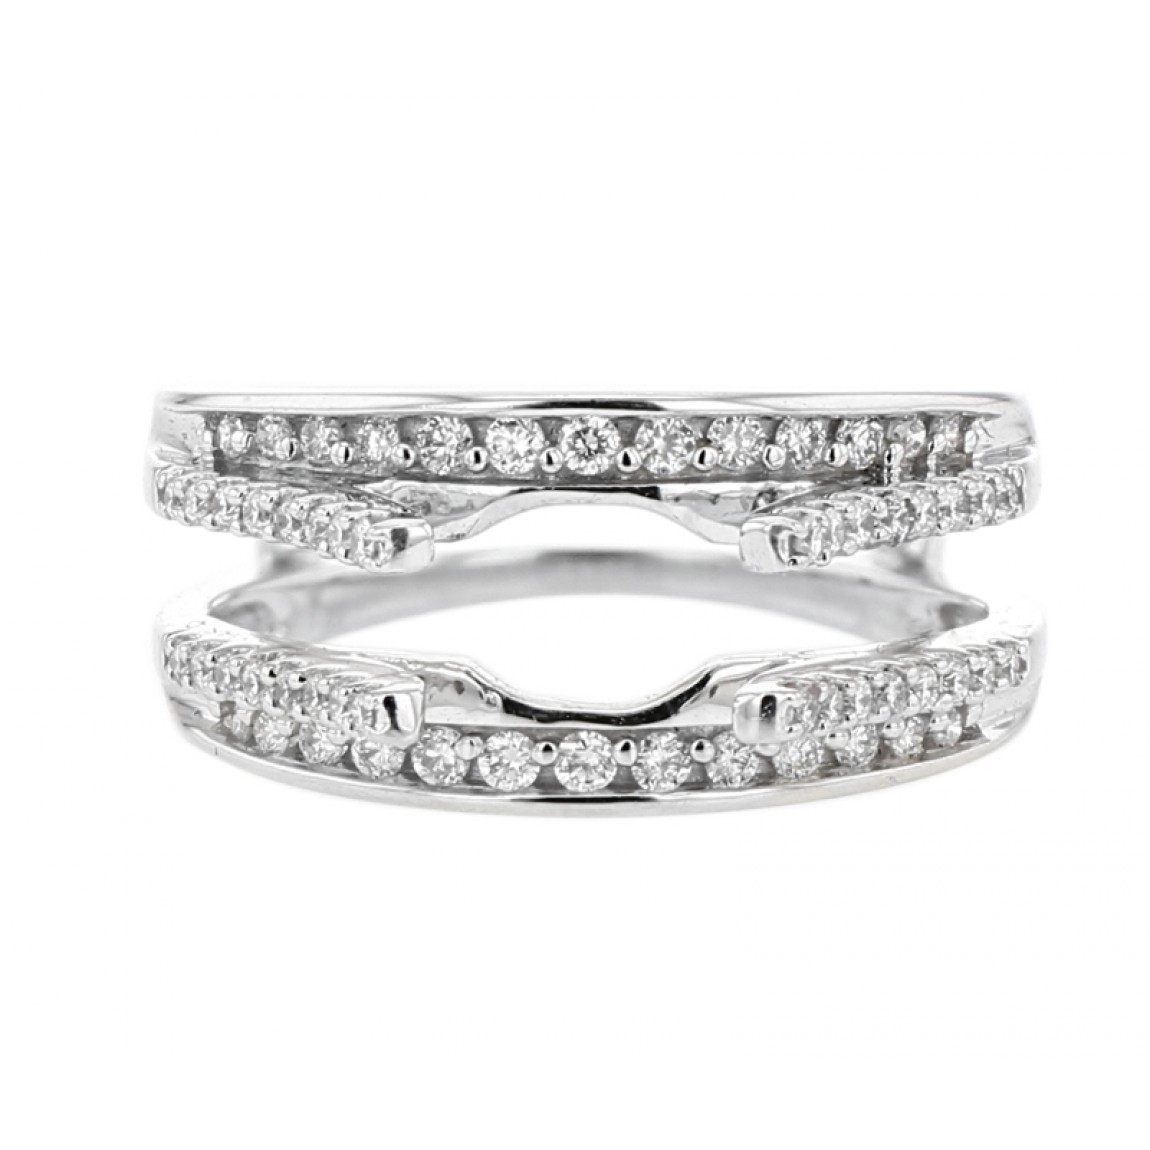 Diamond Cradle Wedding Band, Enhancer Ring, Pave, 14k Gold,  (View 20 of 25)